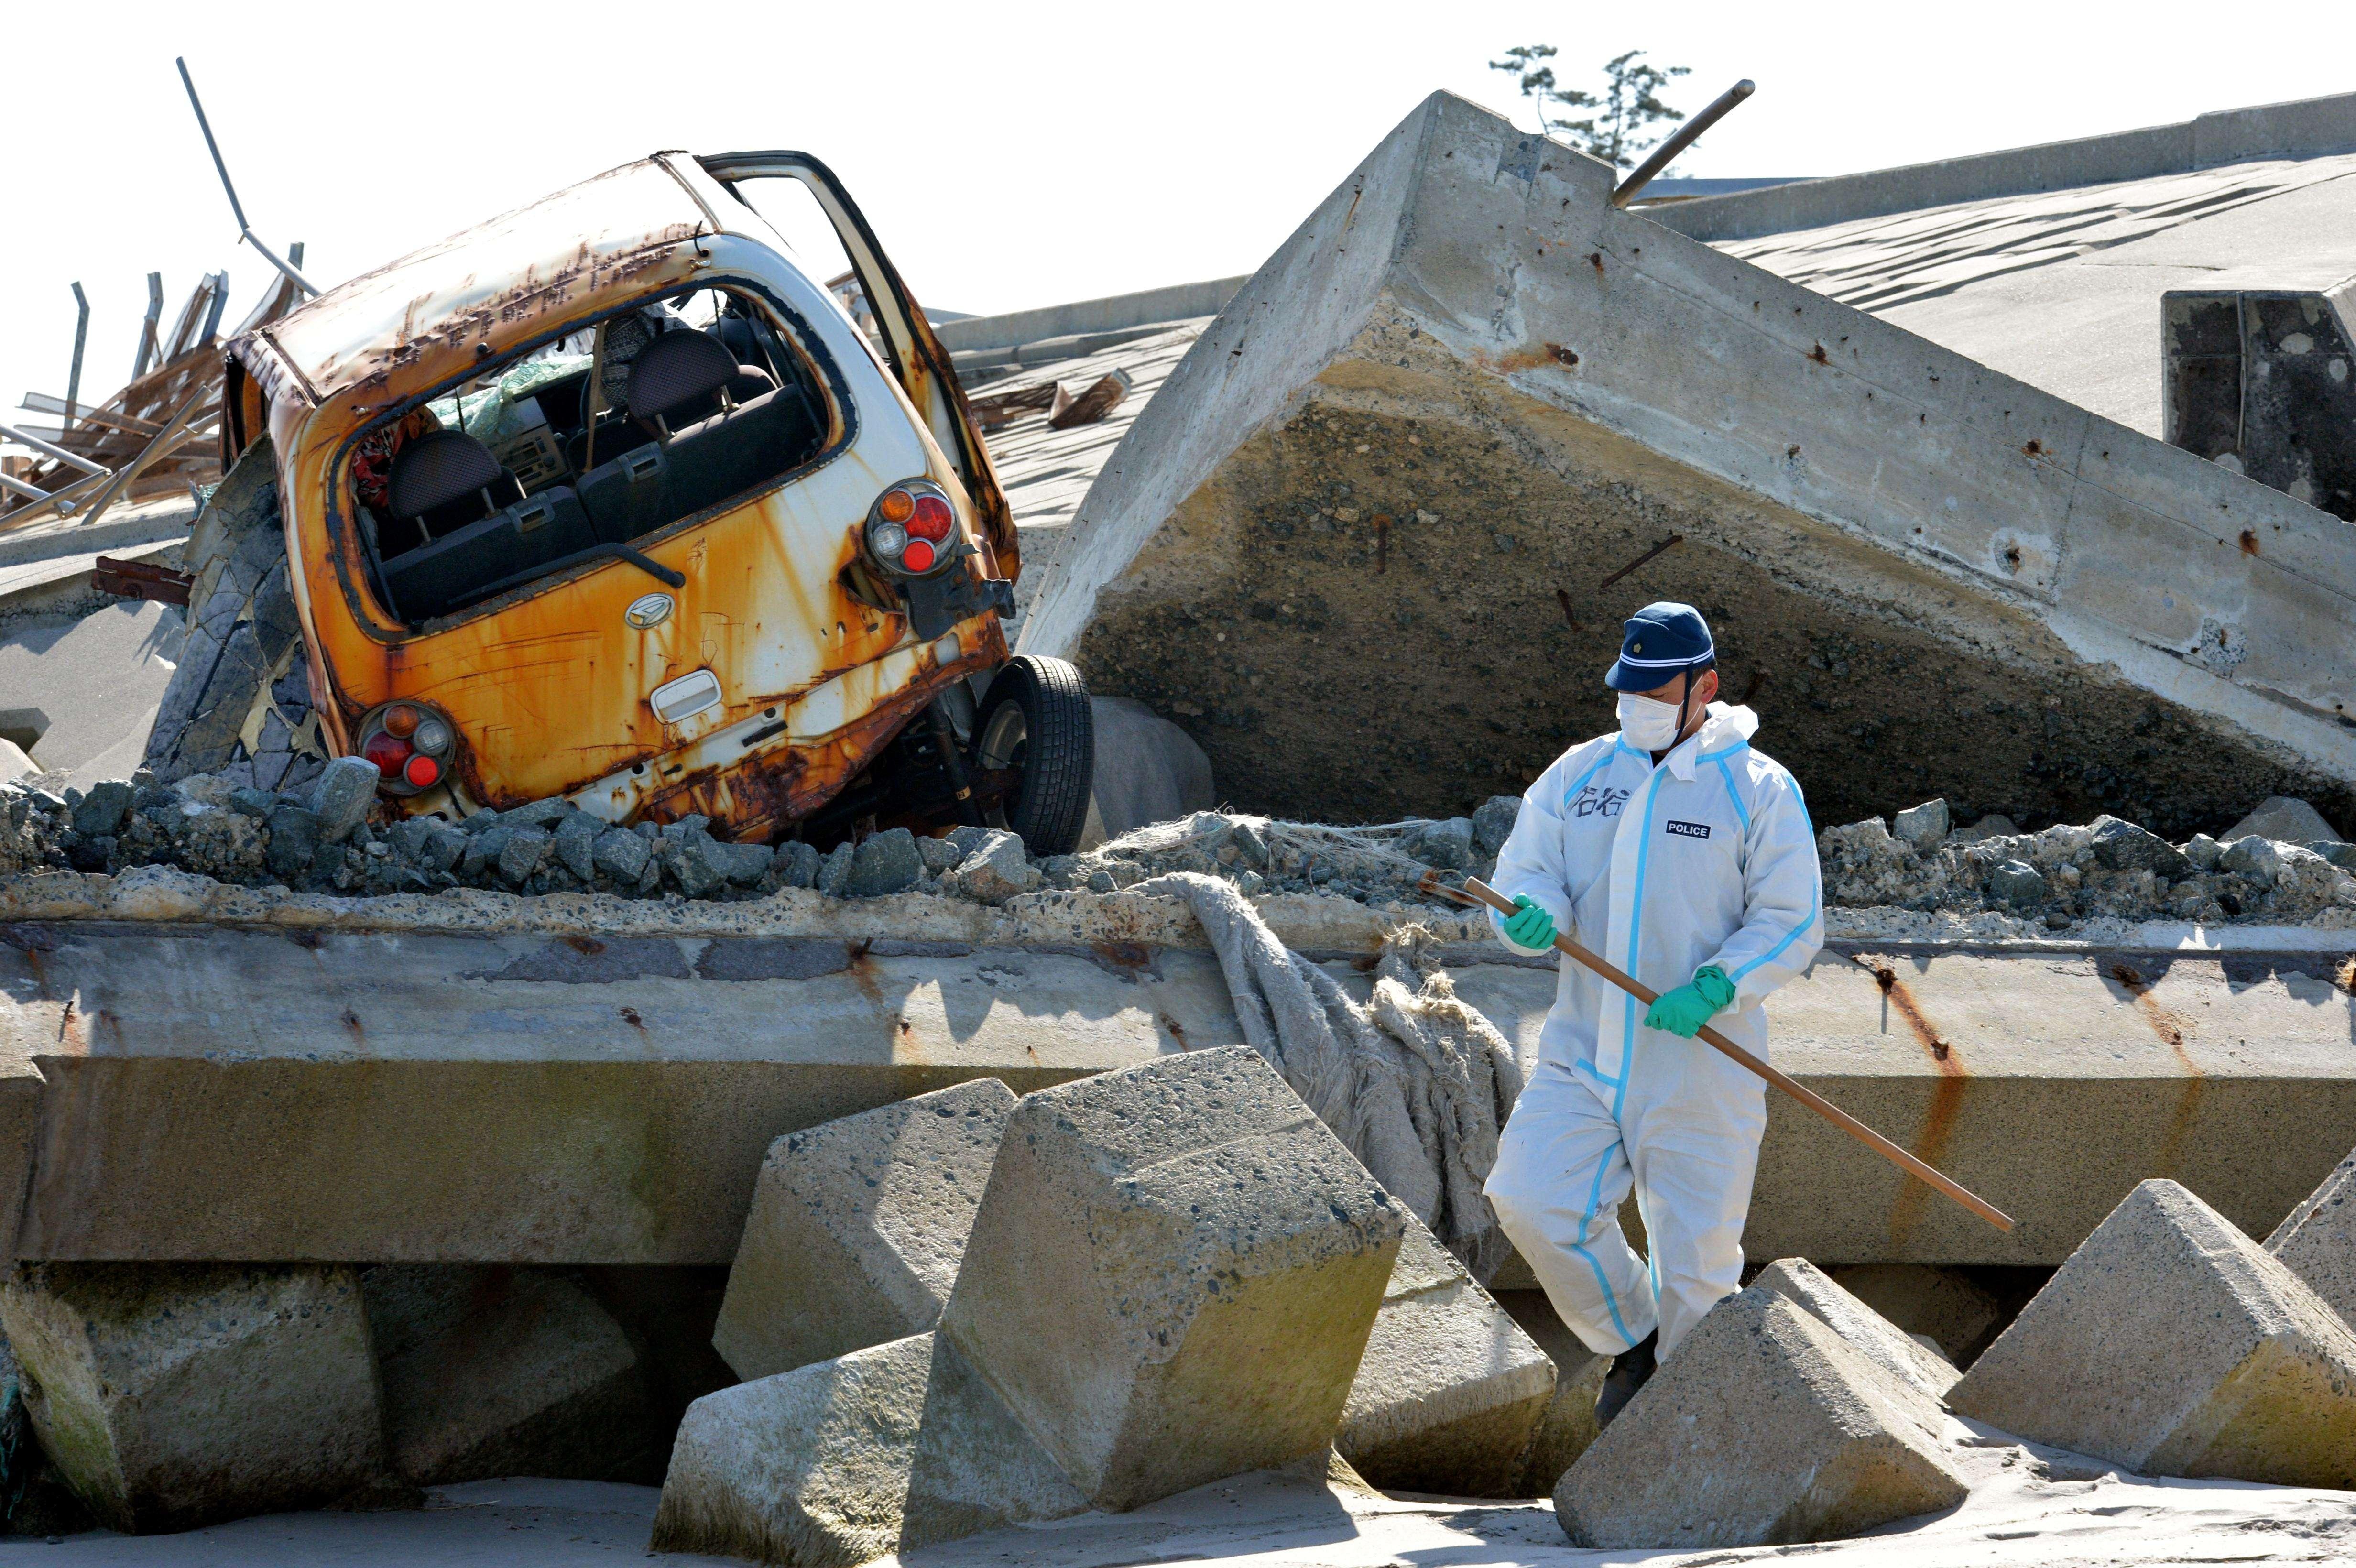 Op de foto een vernielde auto na de tsunami en de kernramp in Fukushima in Japan